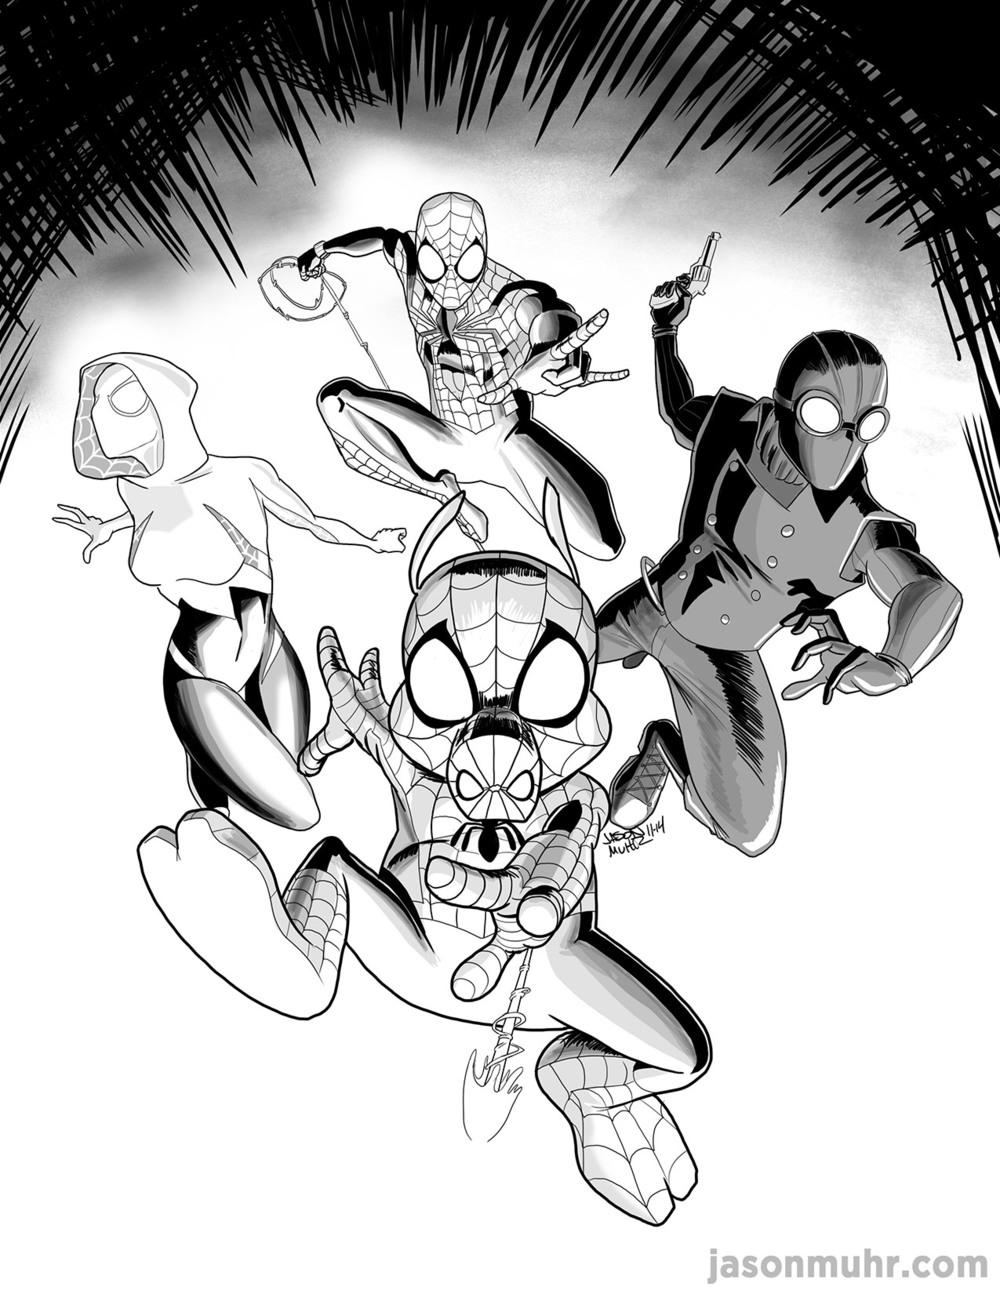 spiderverse_jason_muhr.jpg